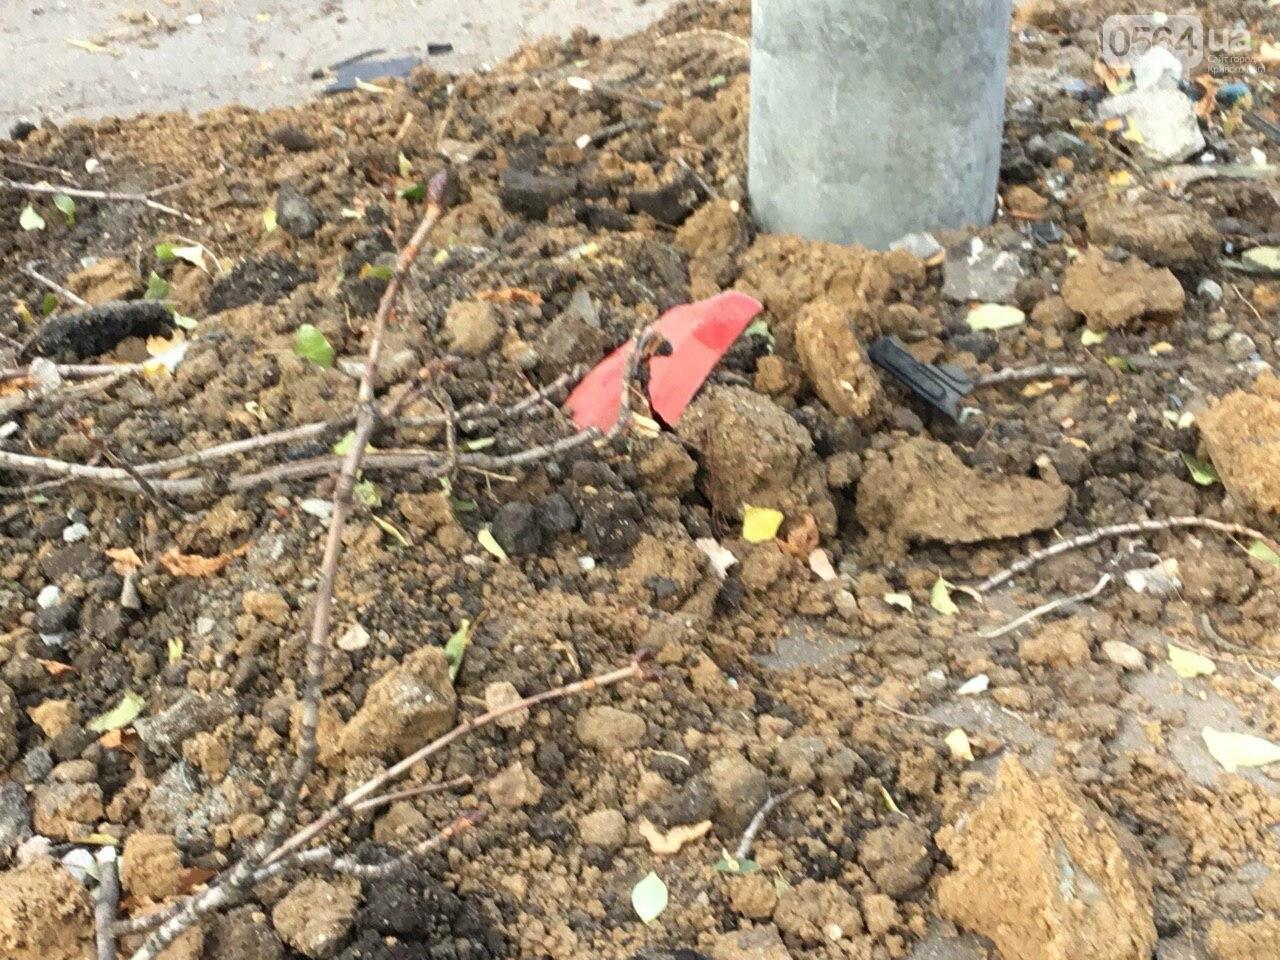 Куски стекла и обшивки разбившейся в Кривом Роге иномарки разлетелись на десятки метров, - ФОТО, фото-11